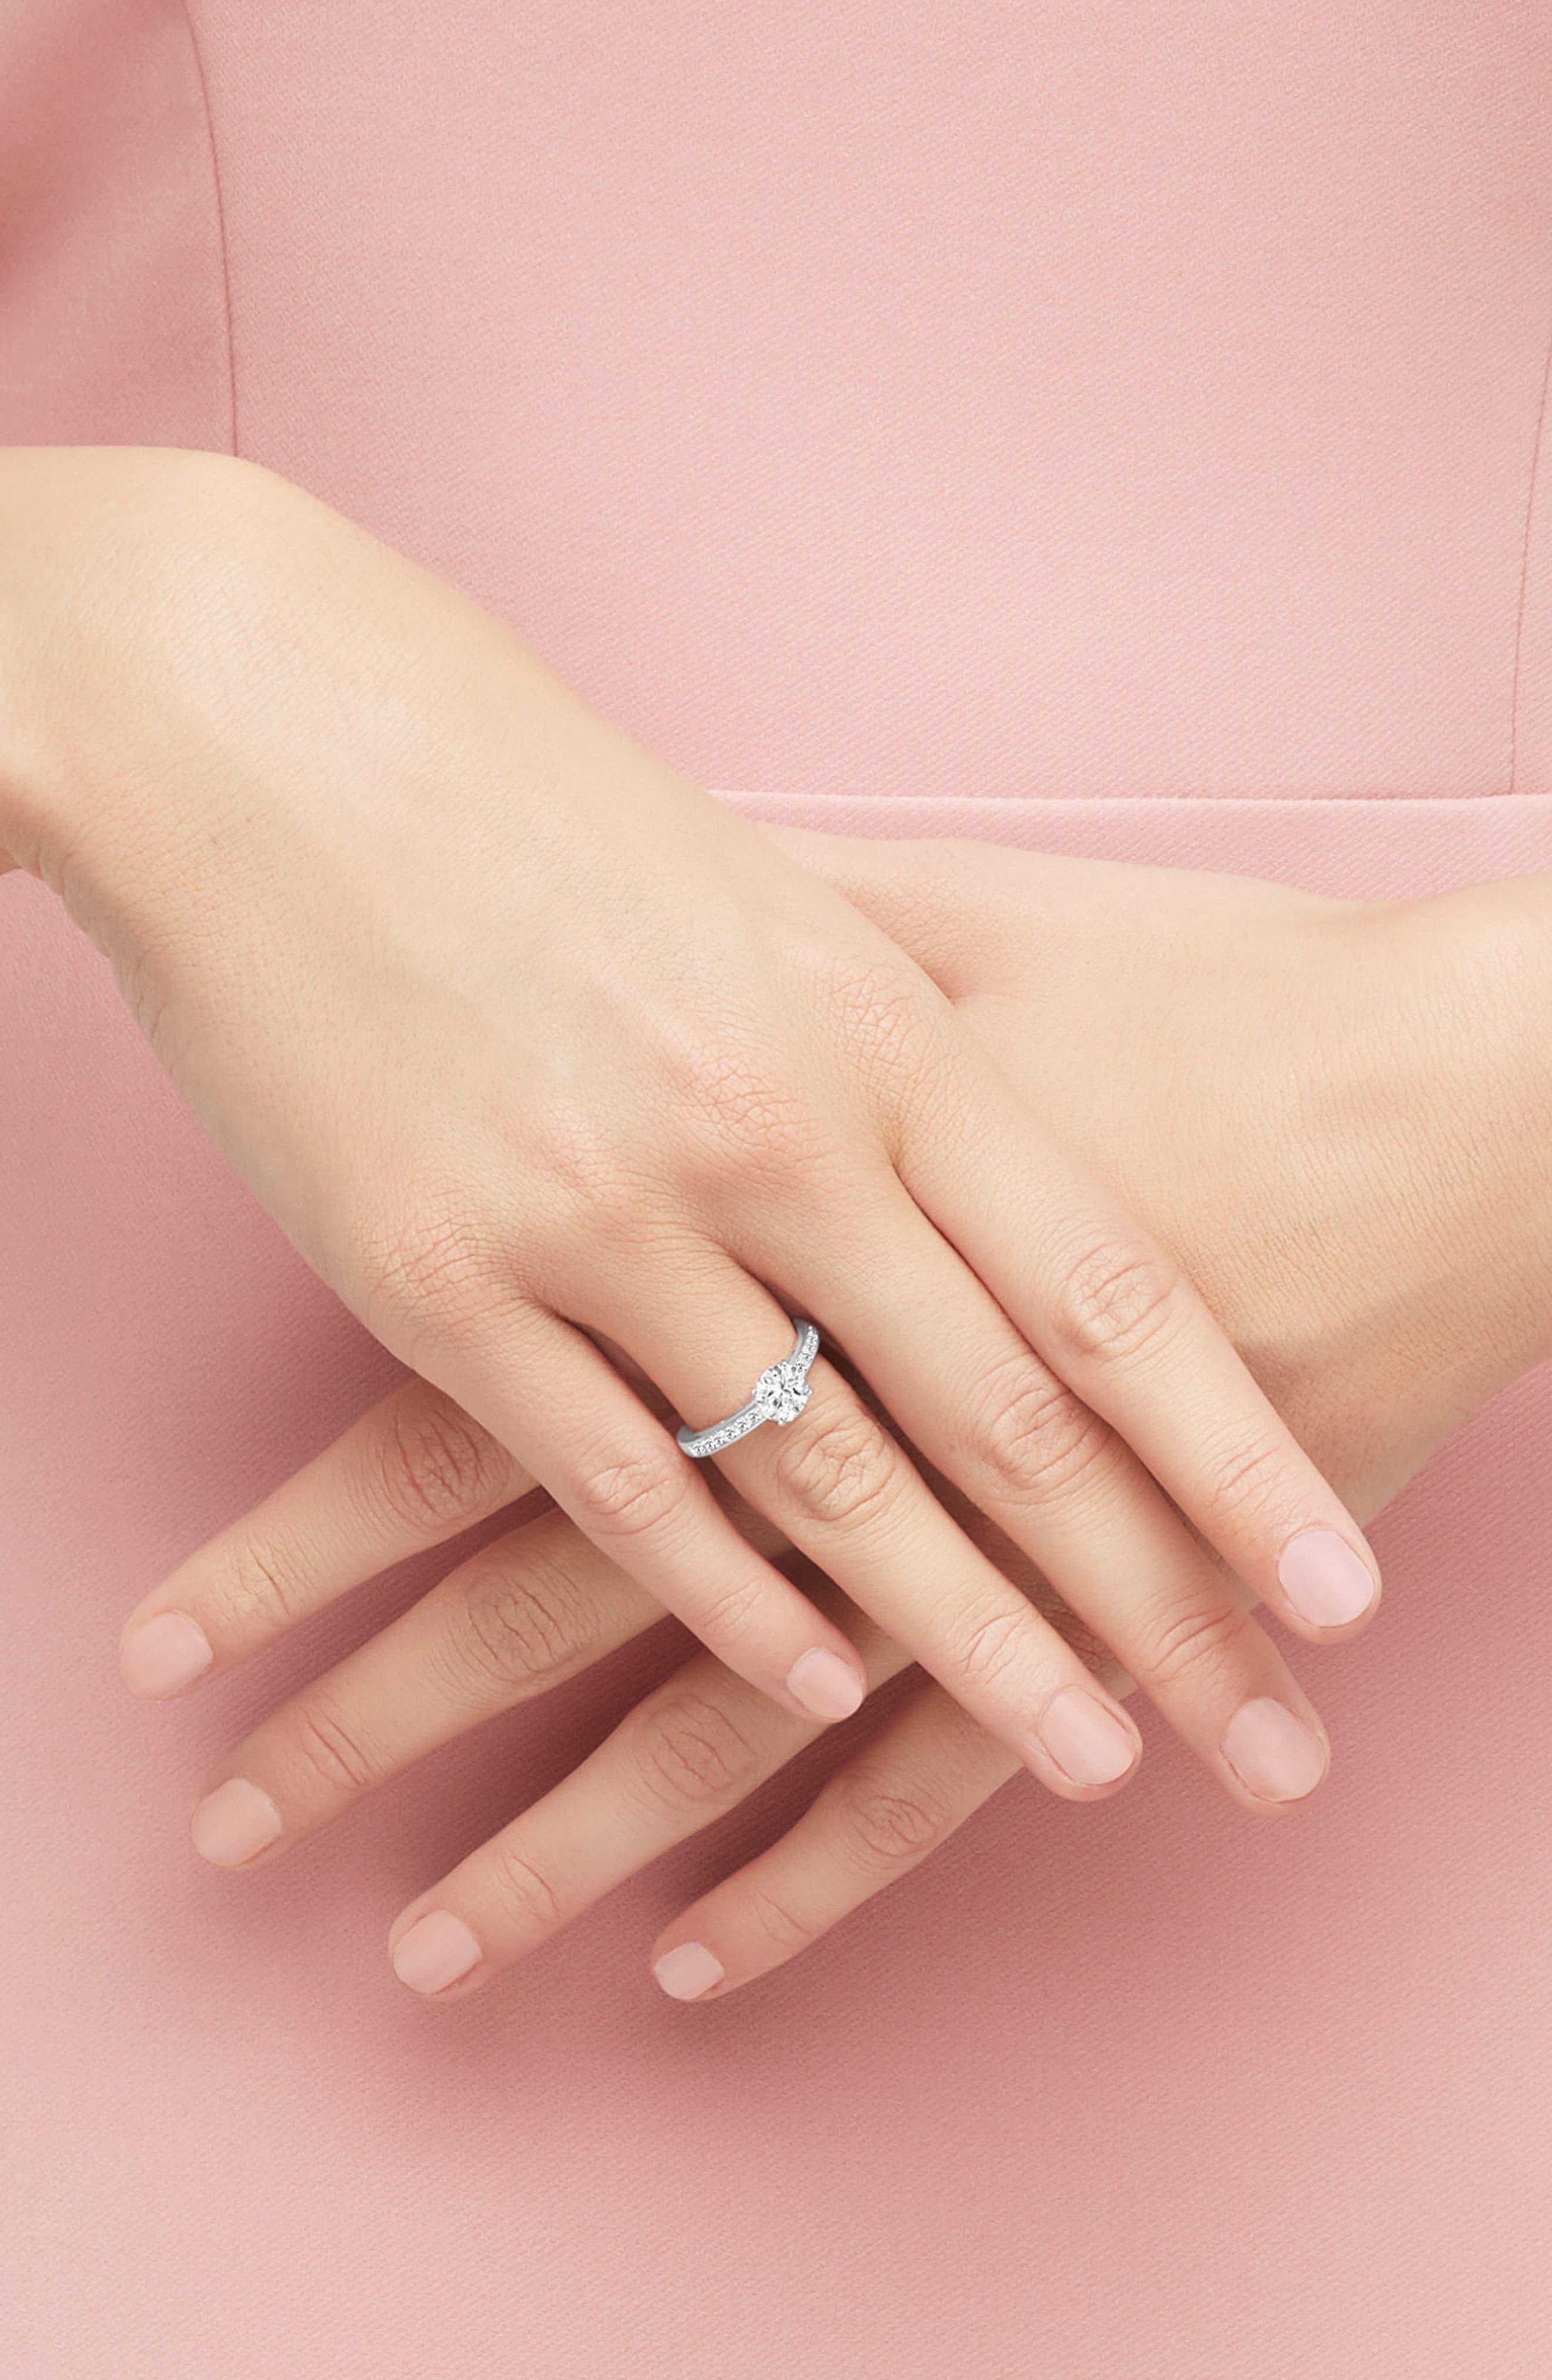 Swarovski New Accessories for Women: Handbags, Jewelry & More ...